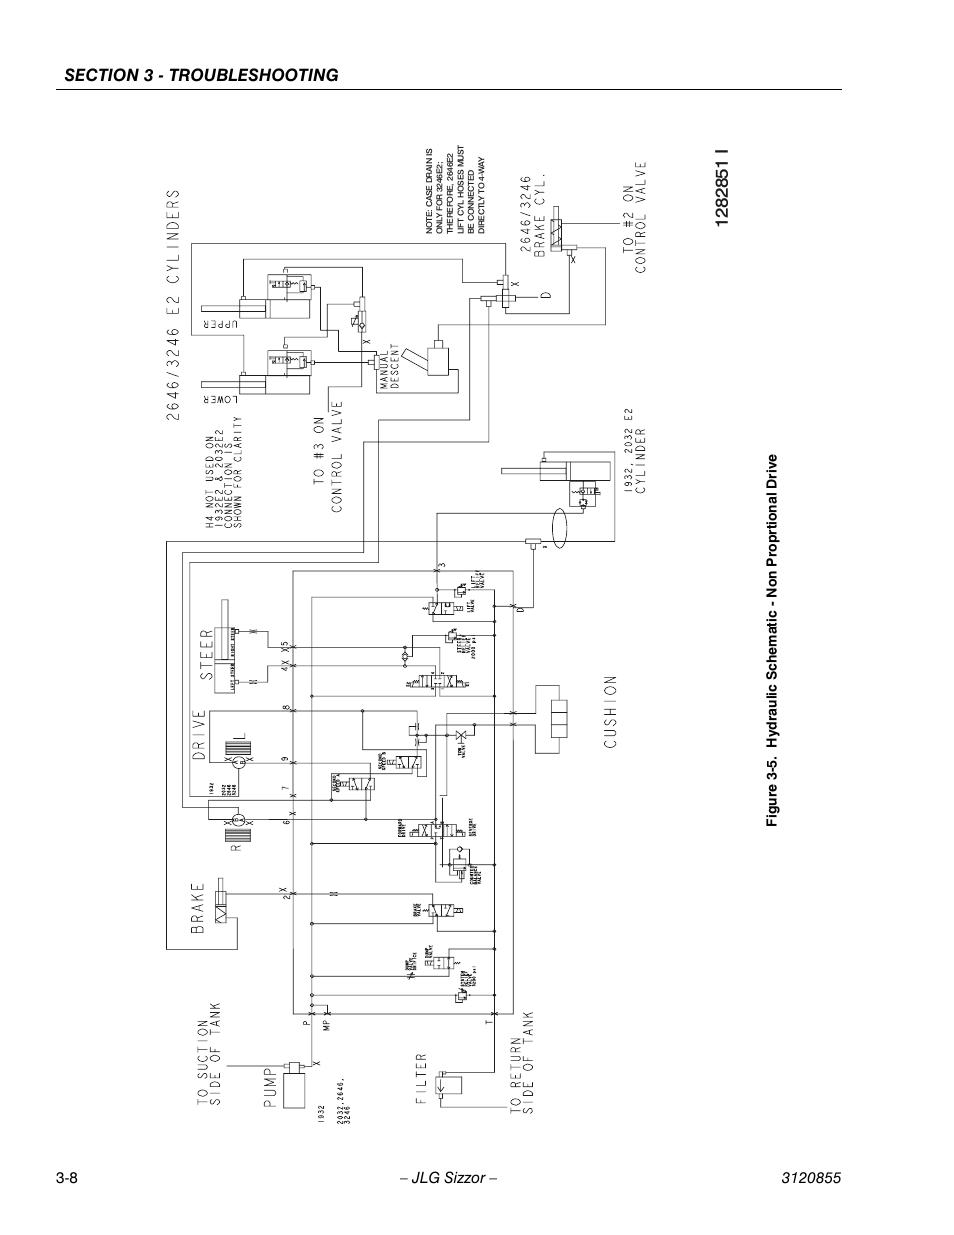 Jlg 2632e2 Wiring Diagram Trusted Diagrams Lull 2032e2 House Symbols U2022